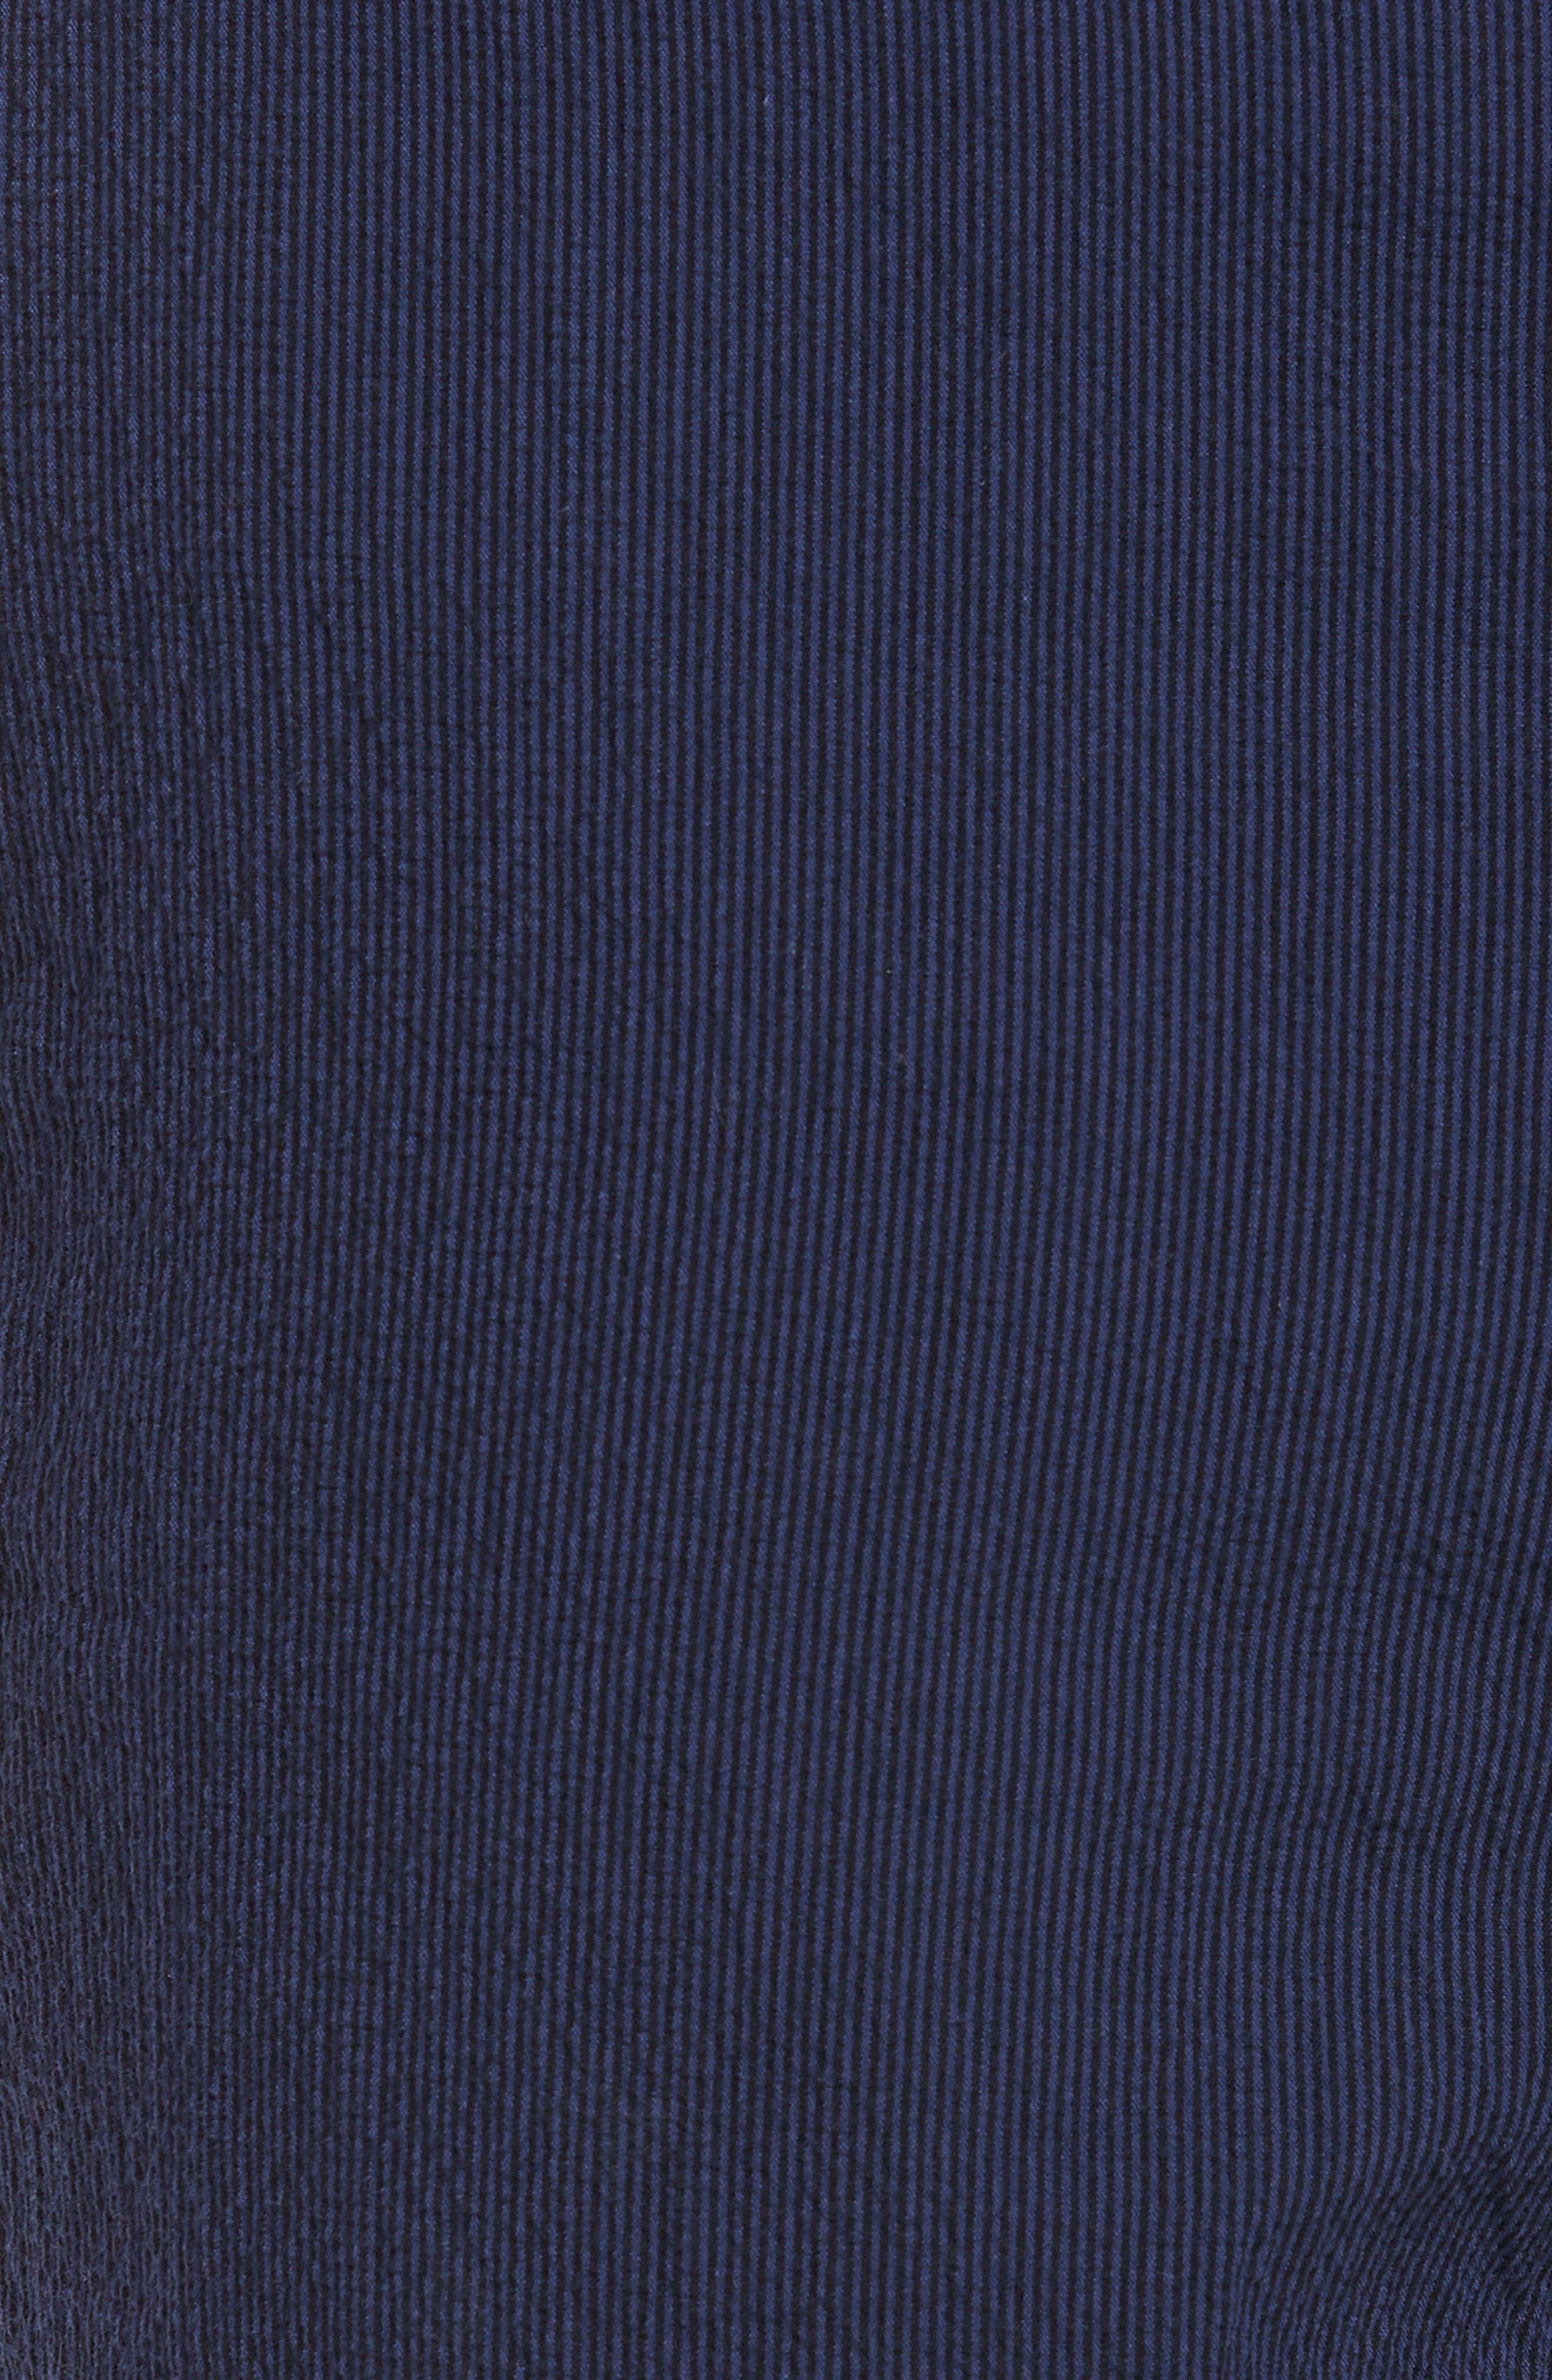 Bryson Regular Fit Shorts,                             Alternate thumbnail 5, color,                             Ripple